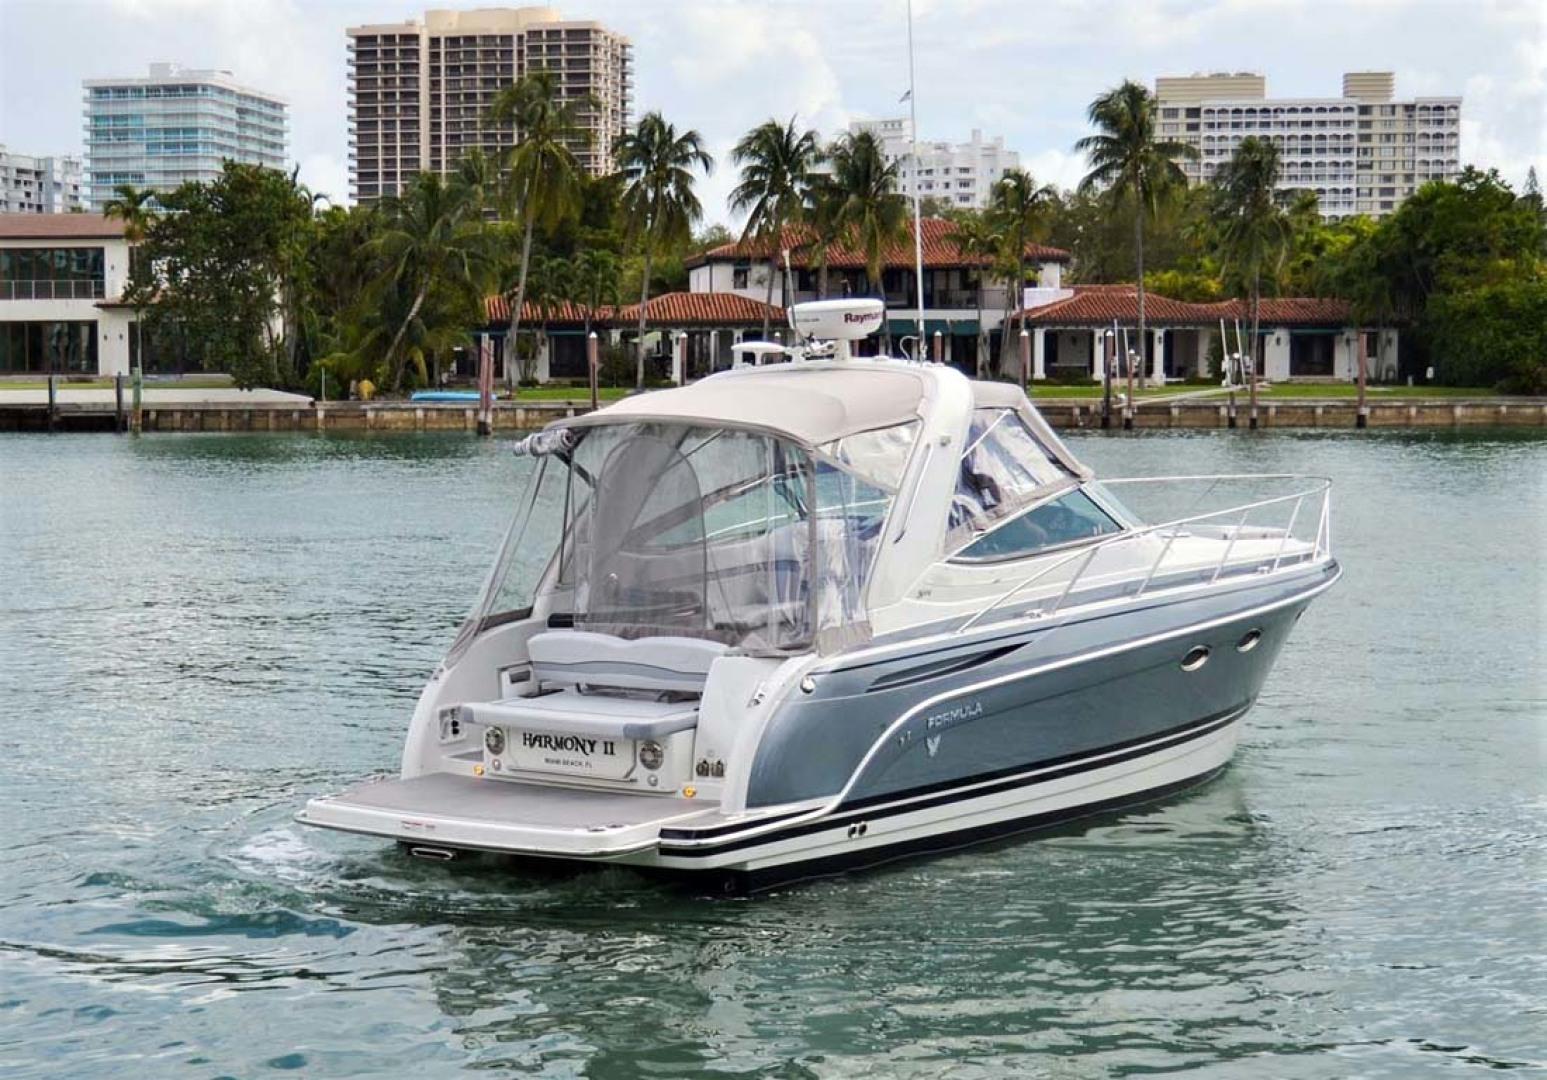 Formula-31-PC-2018-Harmony-II-Bay-Harbor-Islands-Florida-United-States-Starboard-Aft-1086526